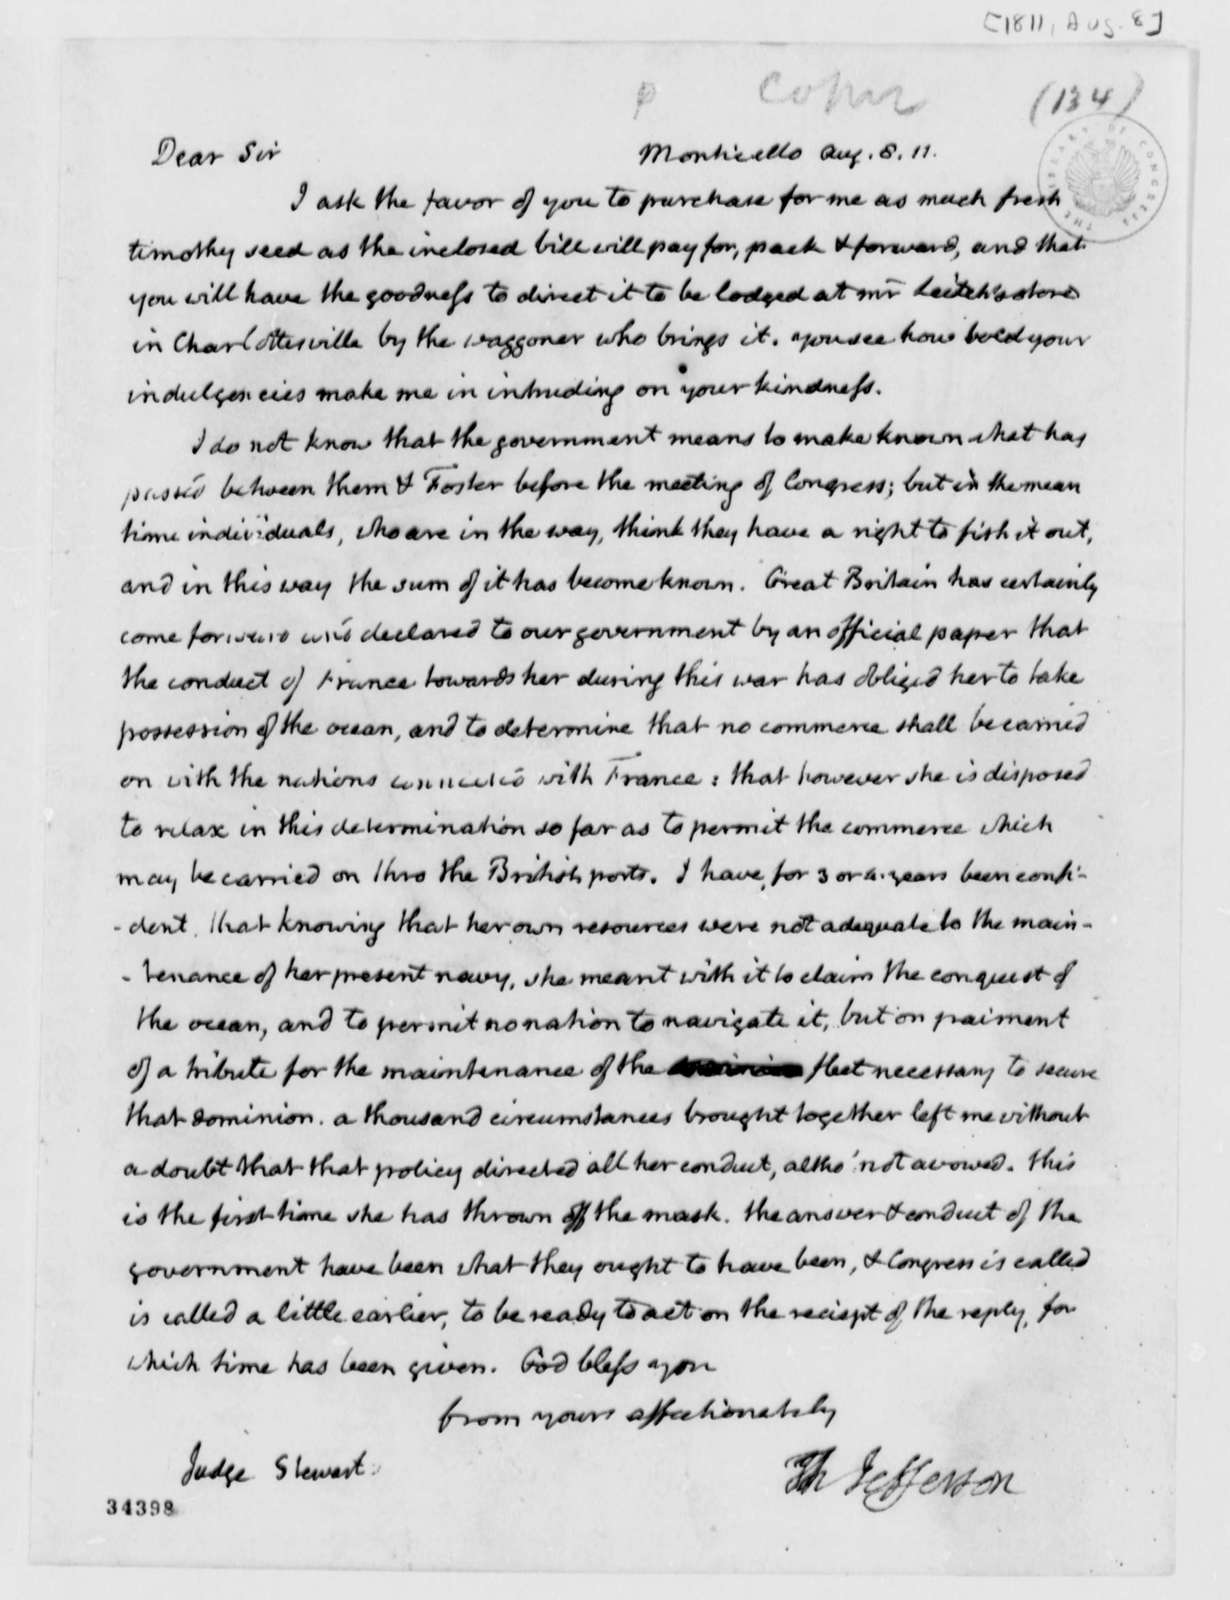 Thomas Jefferson to Archibald Stuart, August 8, 1811